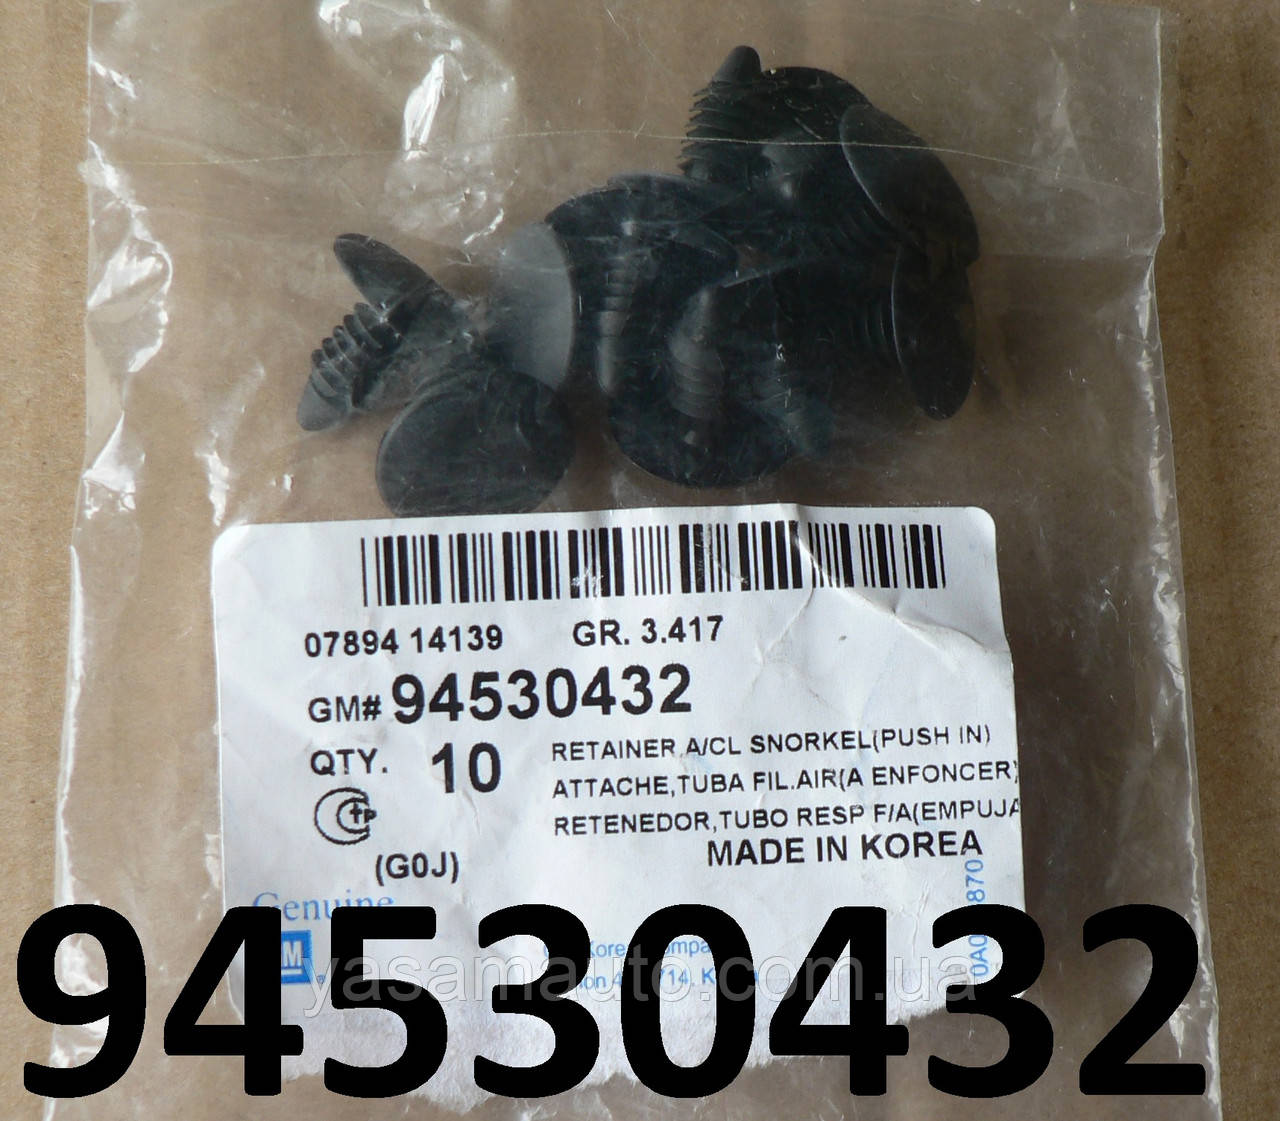 Пистон Aveo багажника 10шт 94530432 пластик черный обшивка клипса Авео